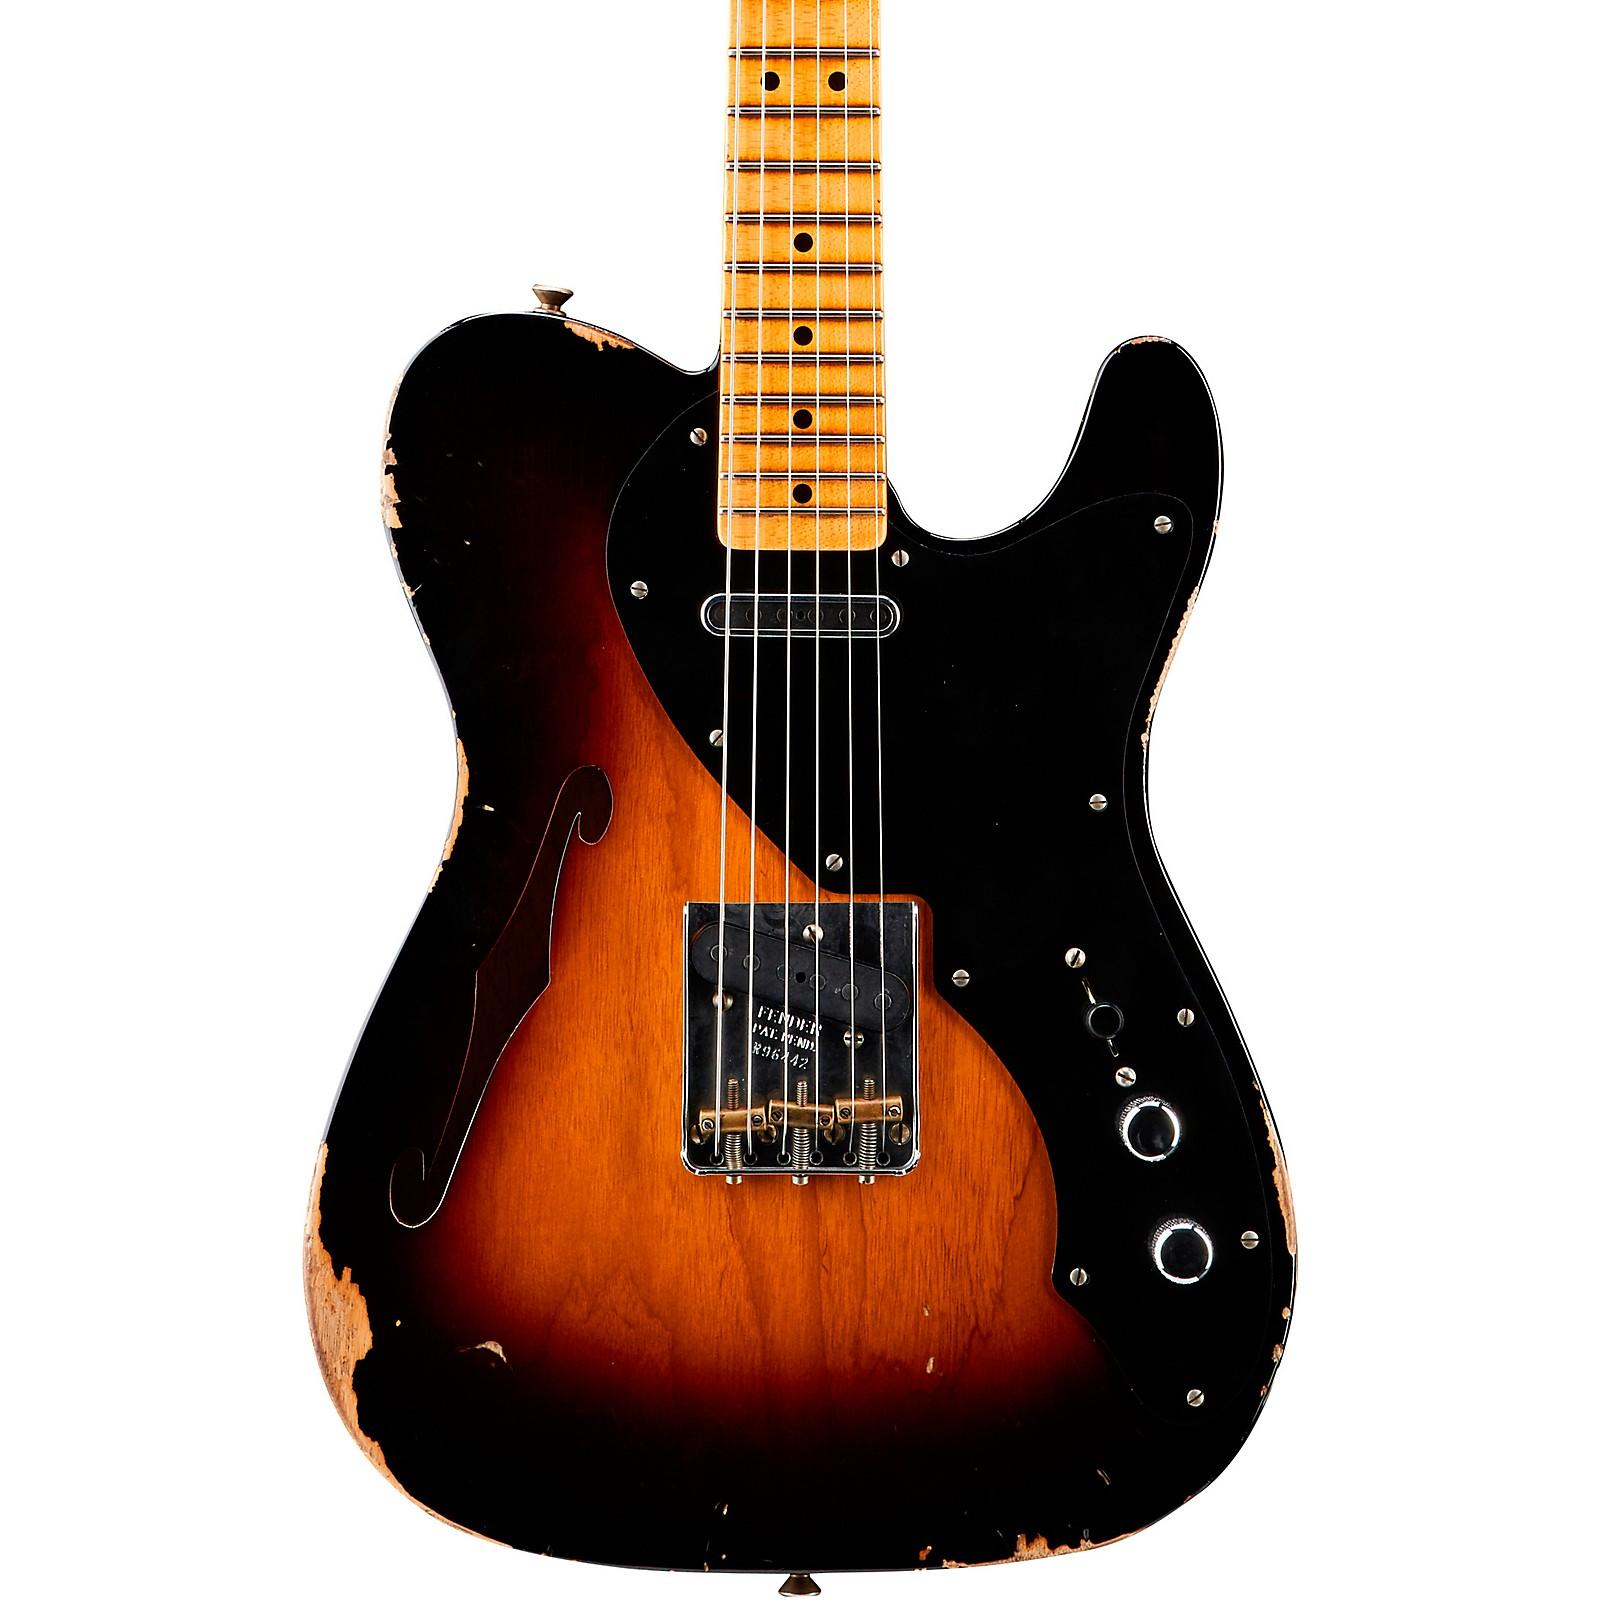 Fender Custom Shop Thinline Loaded Relic Nocaster Electric Guitar